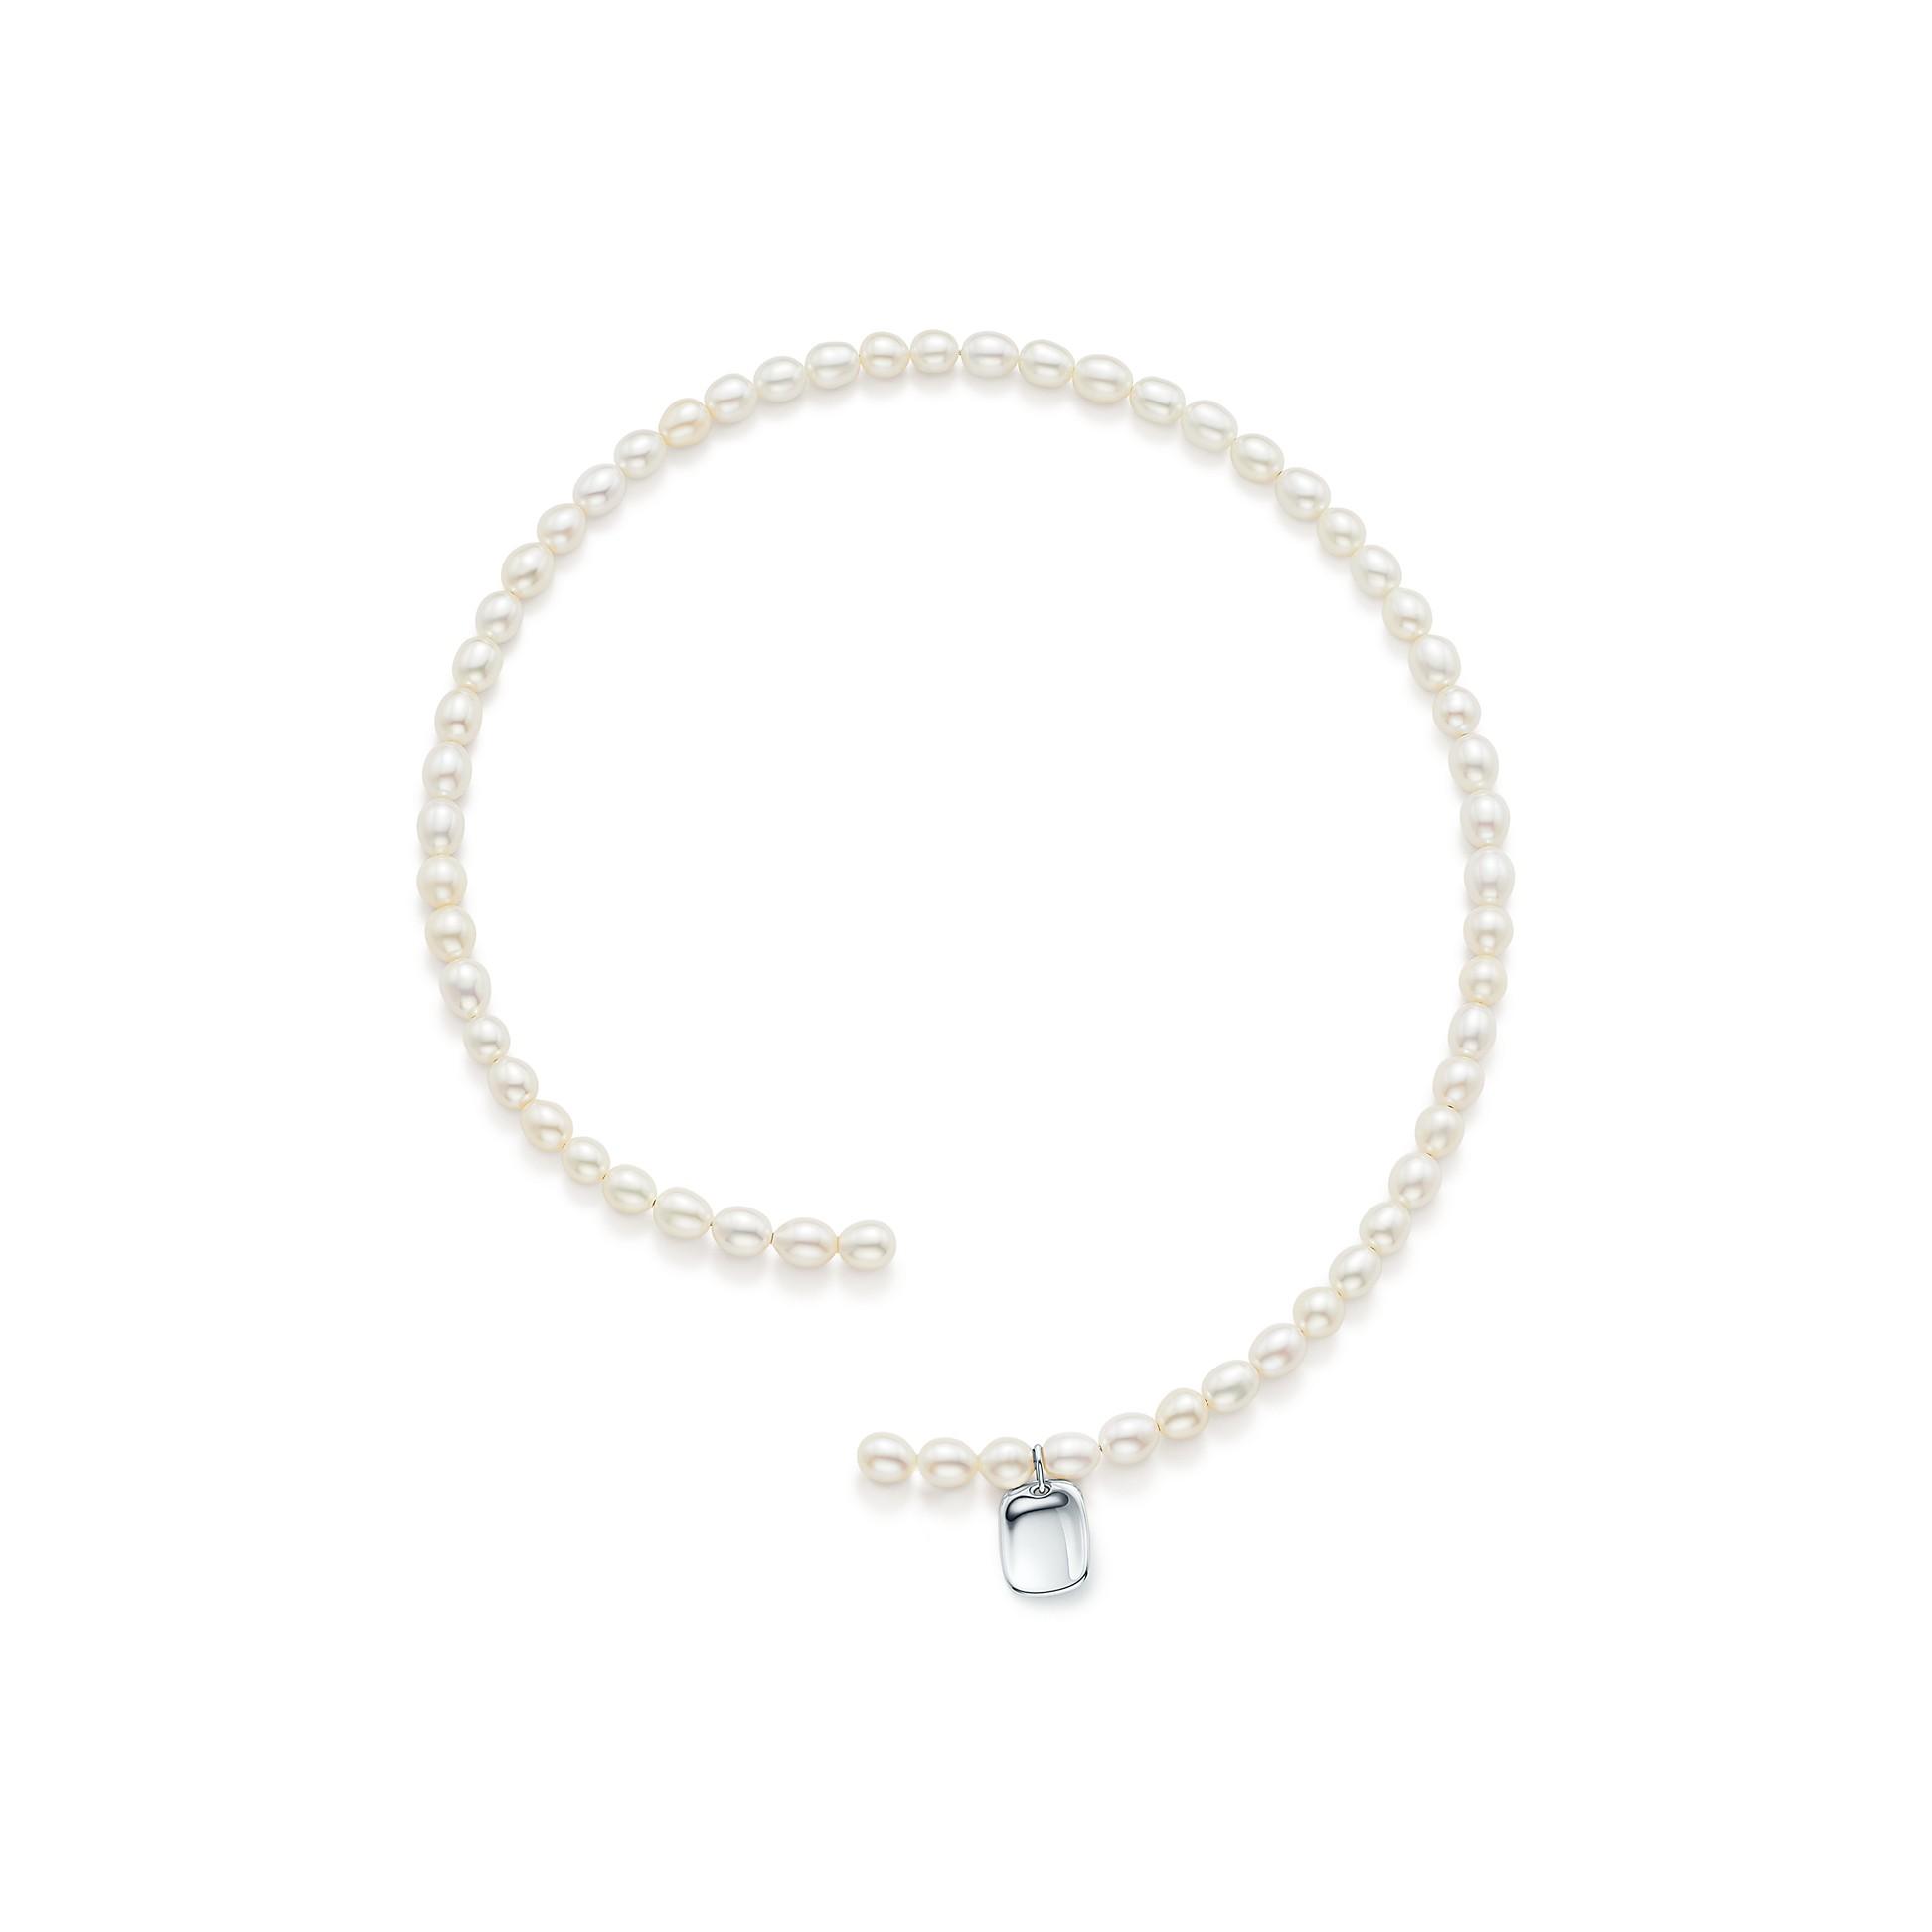 Elsa Peretti®        Pearl Tag Necklace by Elsa Peretti®